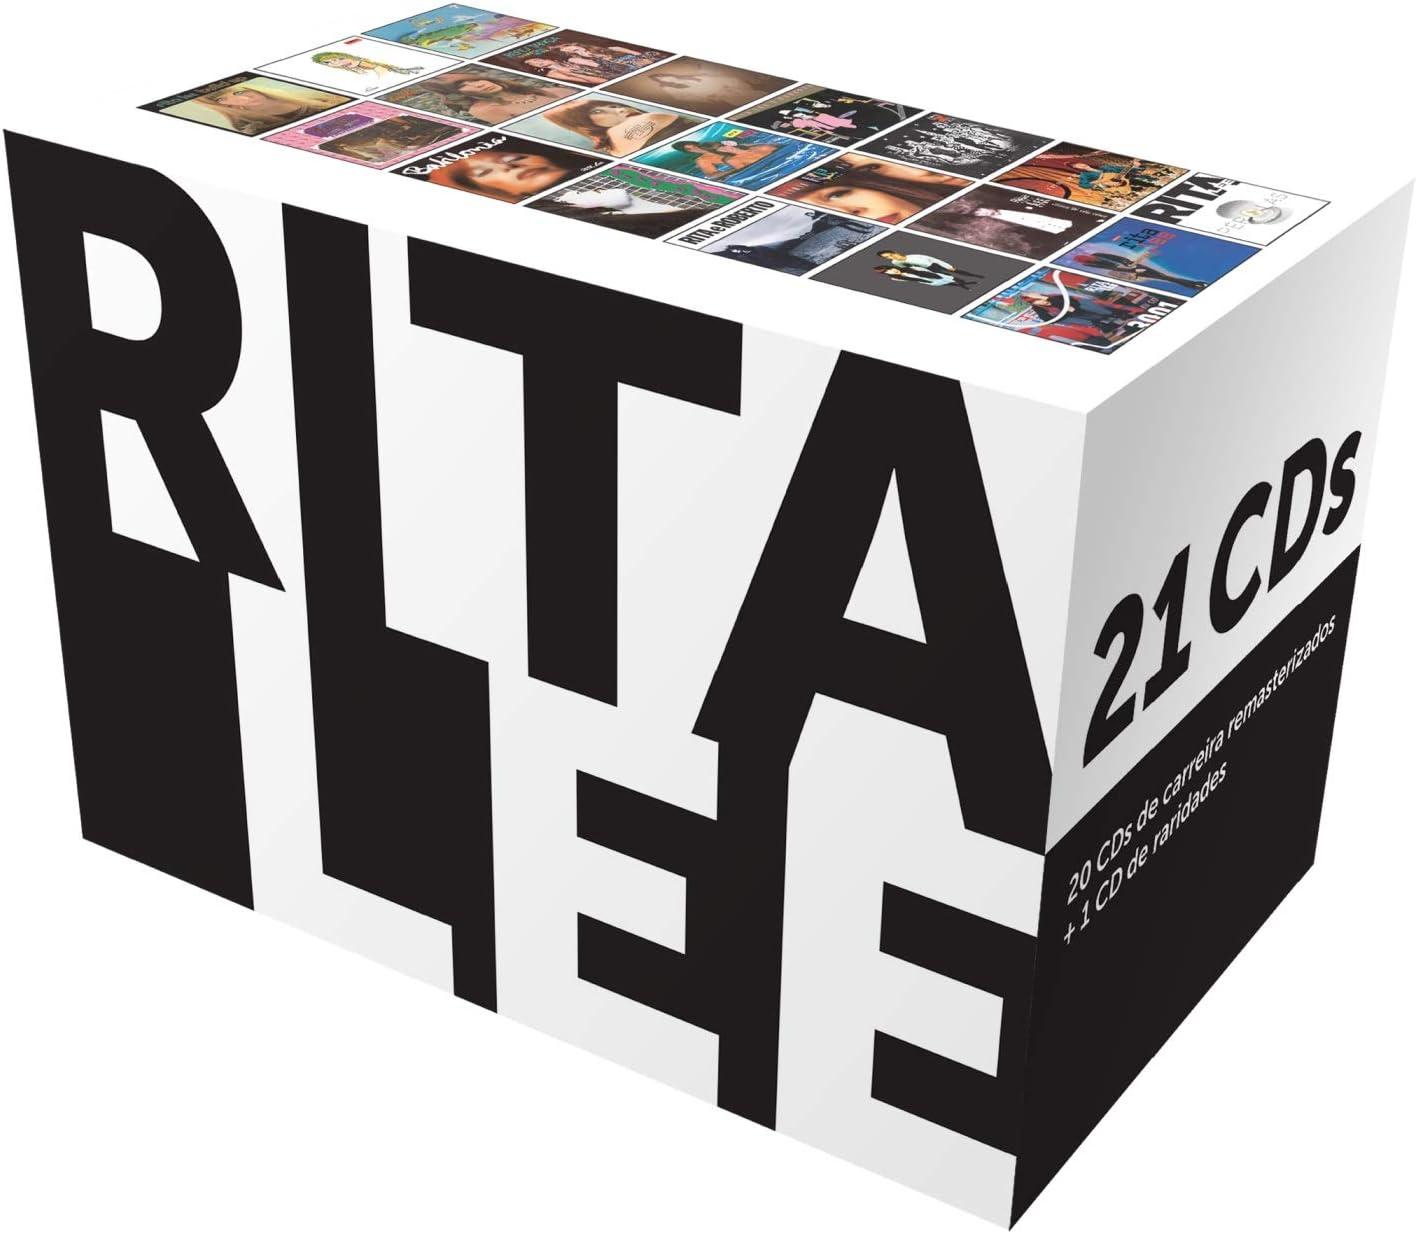 Rita Lee - Discografia [CD]